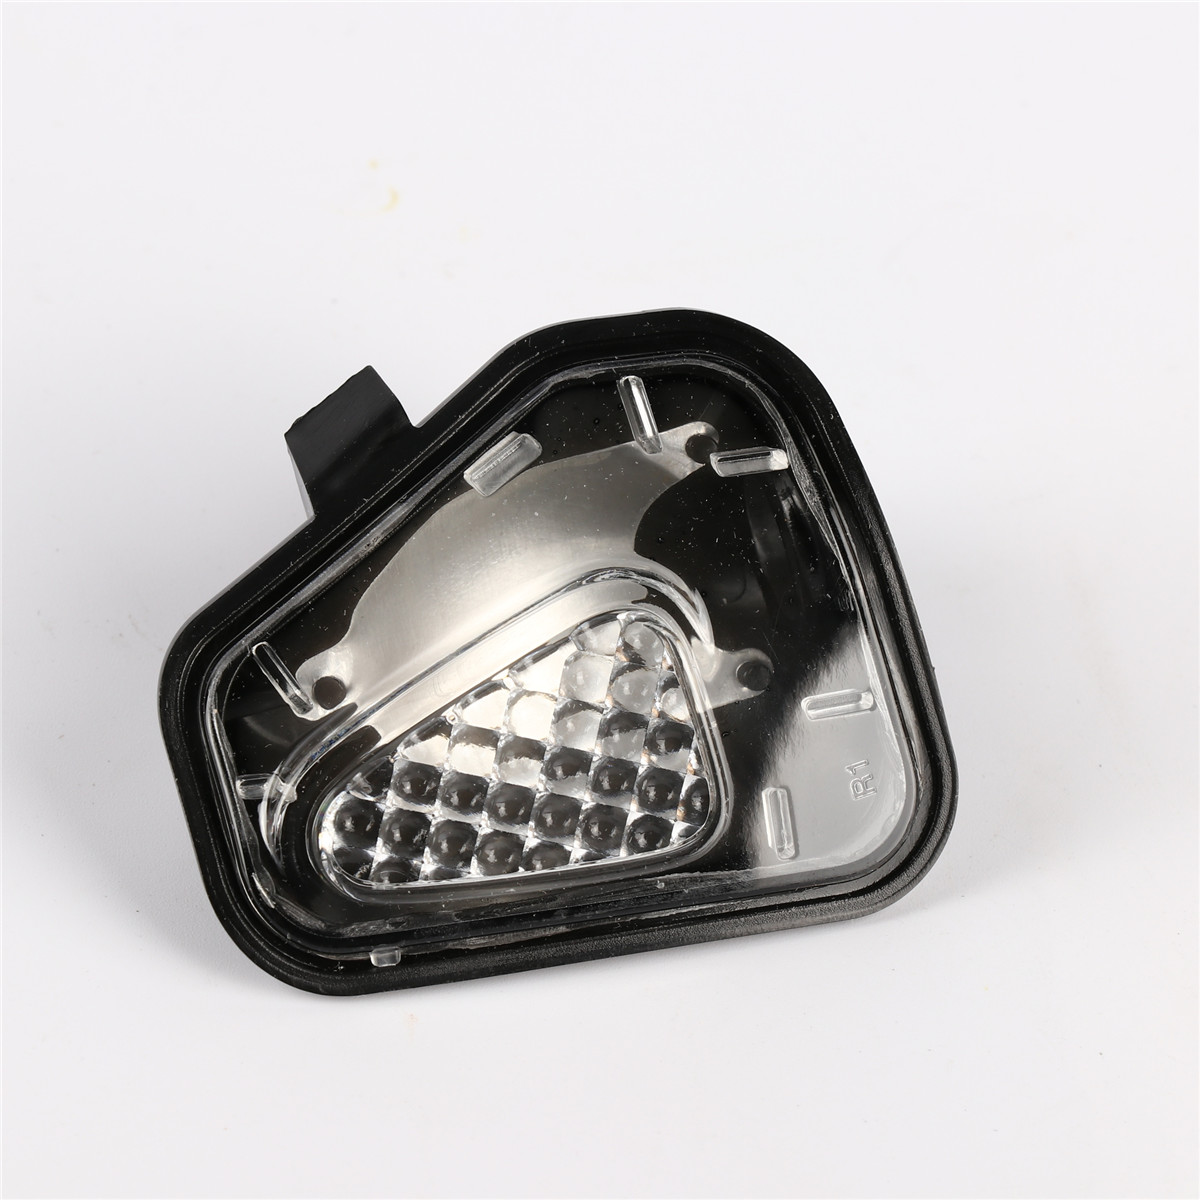 OEM 1Pcs New Right Marker Fender Lights Turn Signal Lamp Peripheral light For VW Passat B7/Passat CC/Passat CC NF 35D 945 292 passat b3 светодиодные фары купить